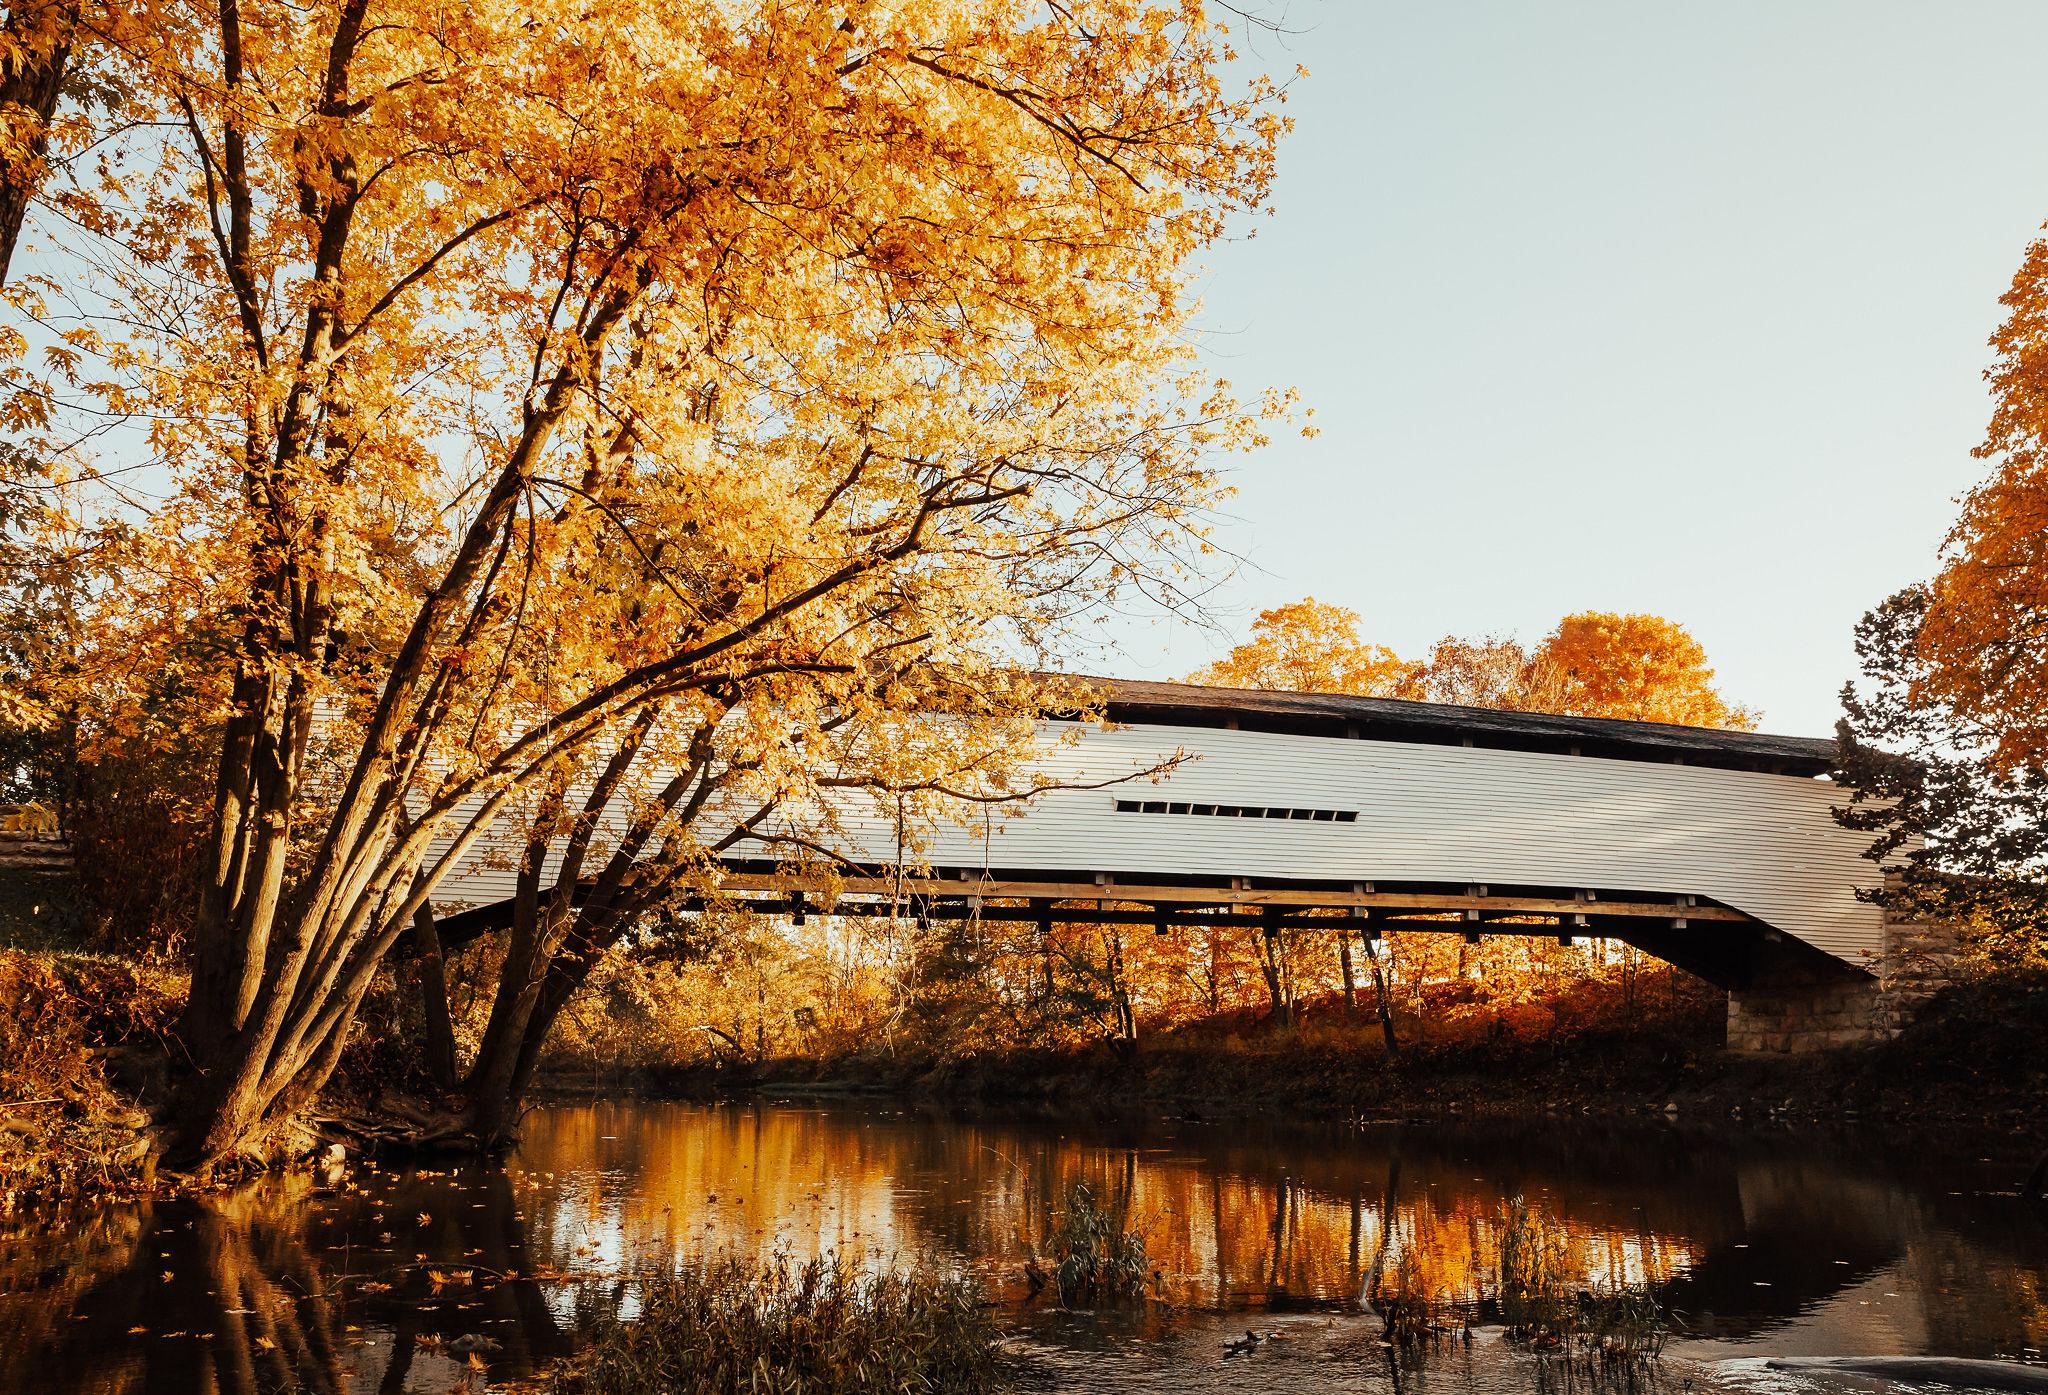 Union_Covered_Bridge_State_Historic_Site